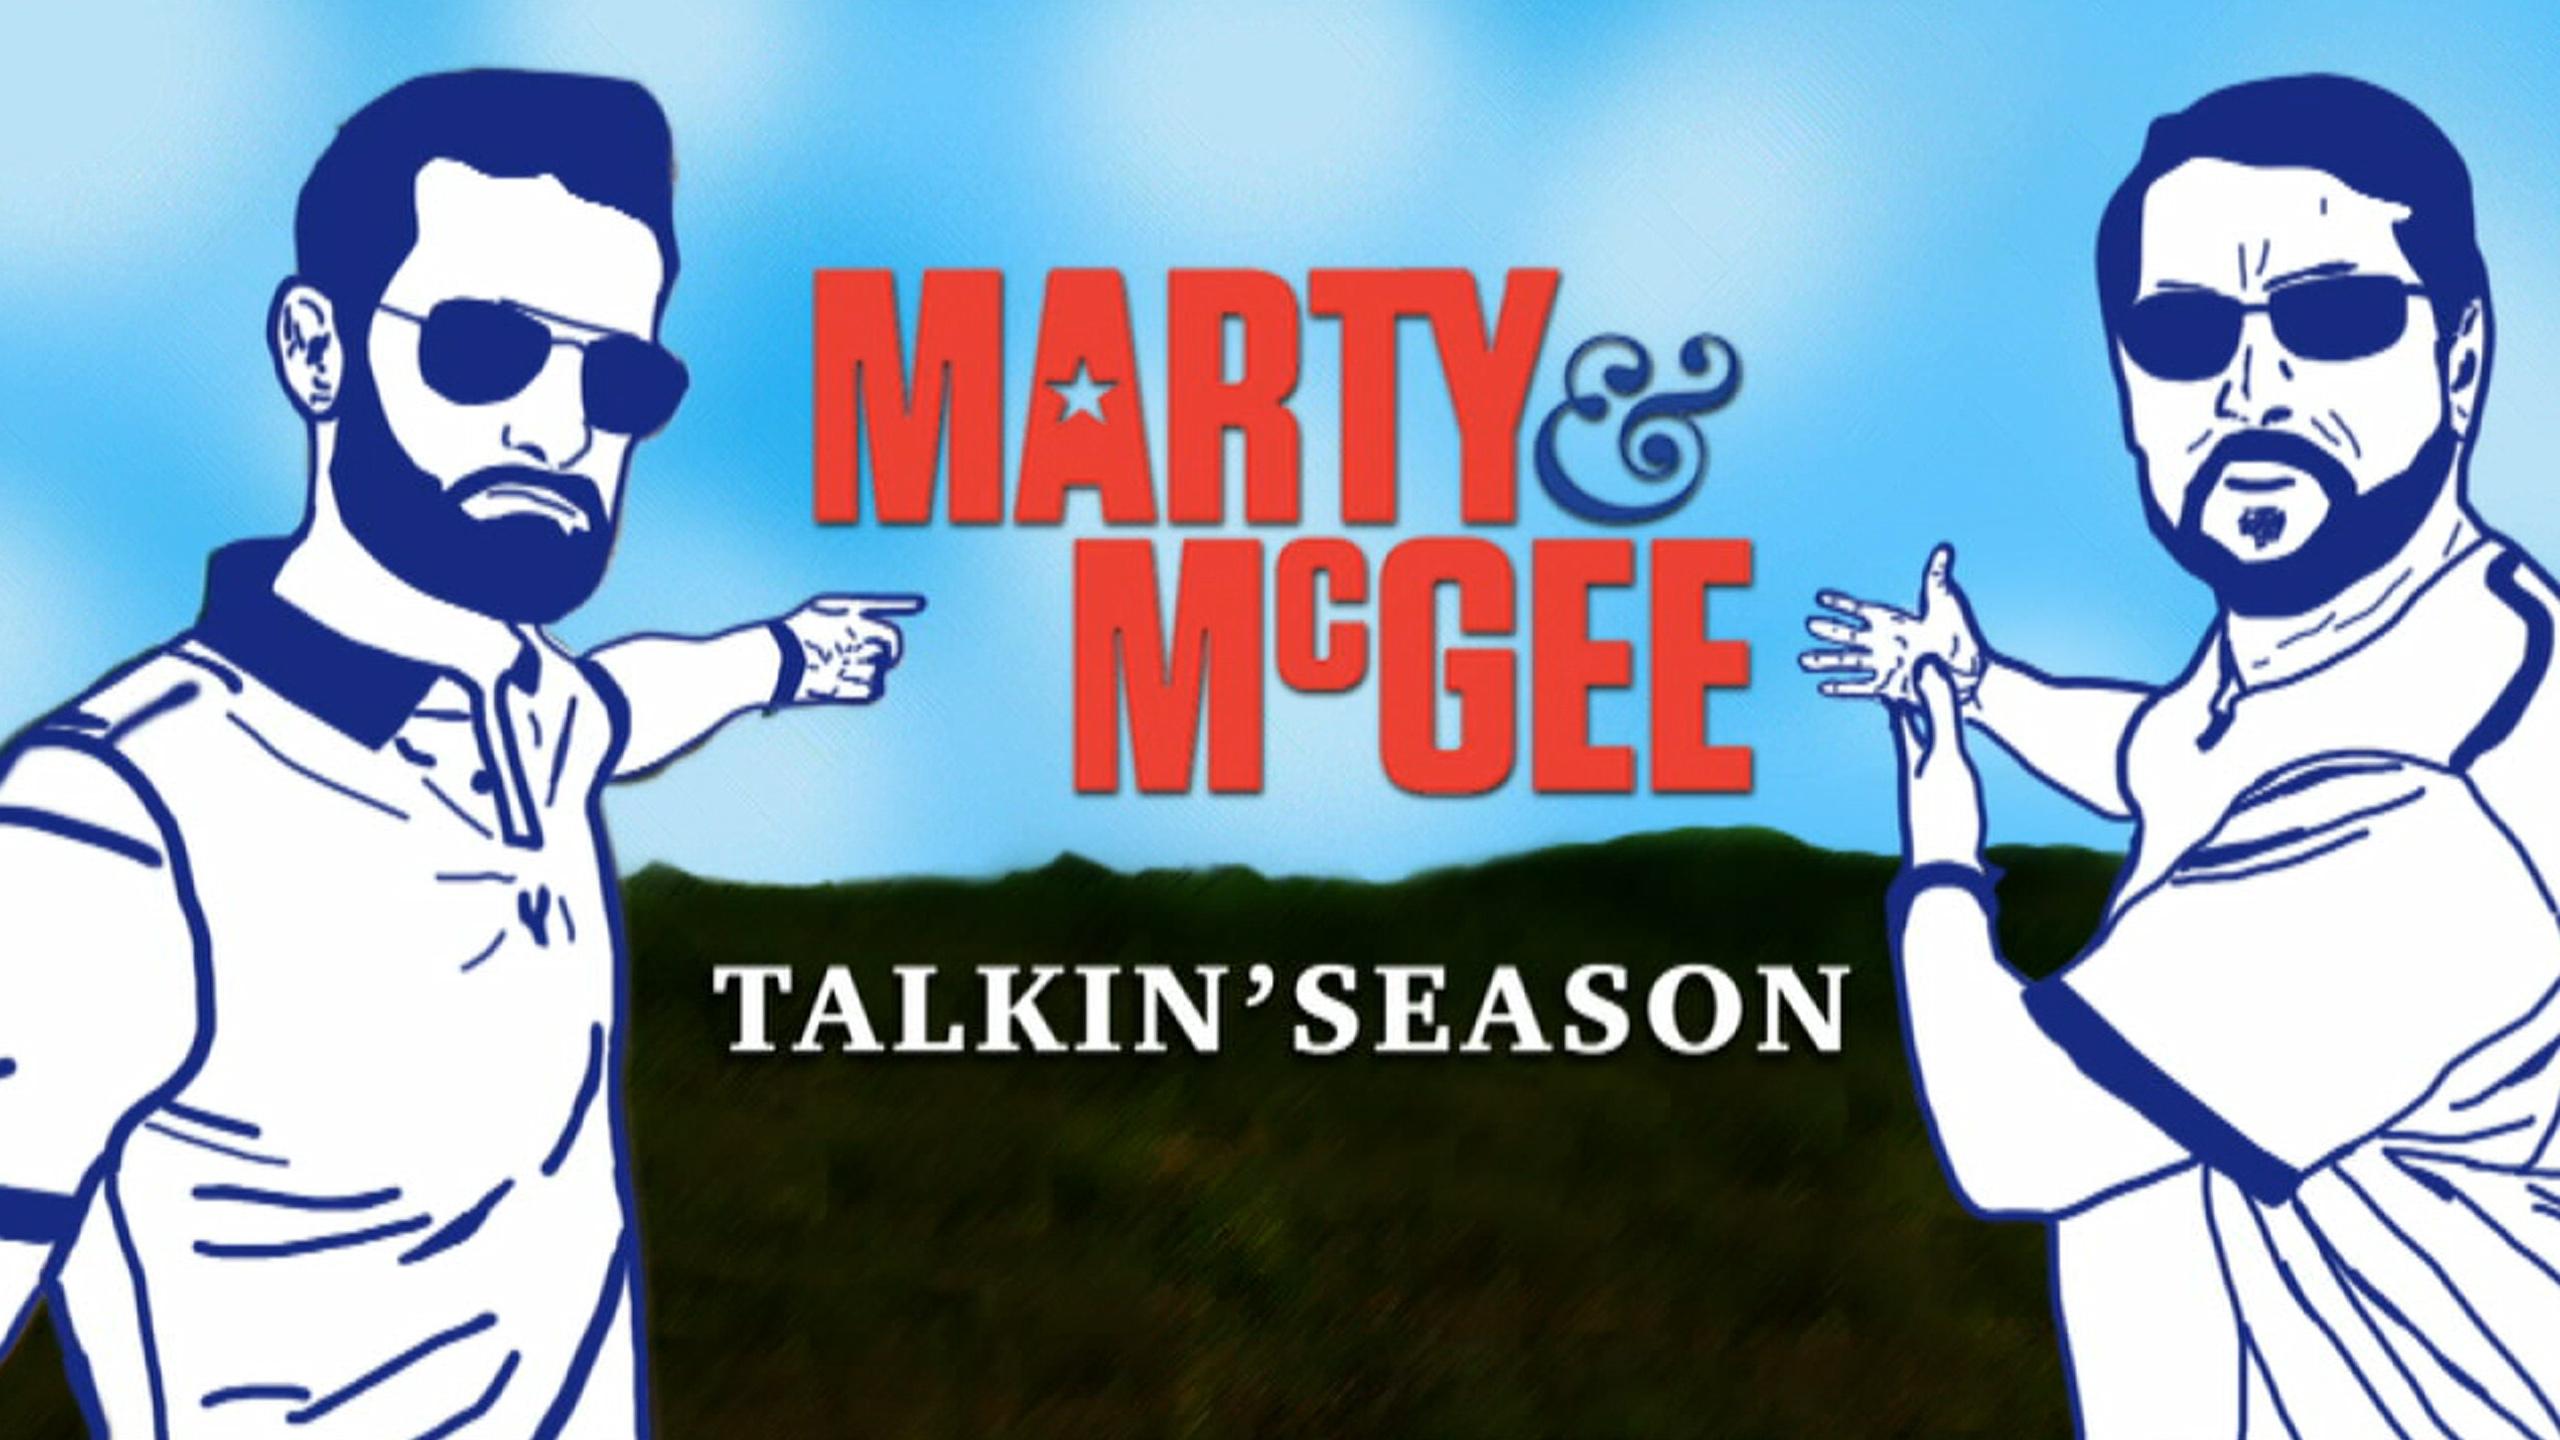 Marty & McGee: Talkin' Season – SEC West Coaches